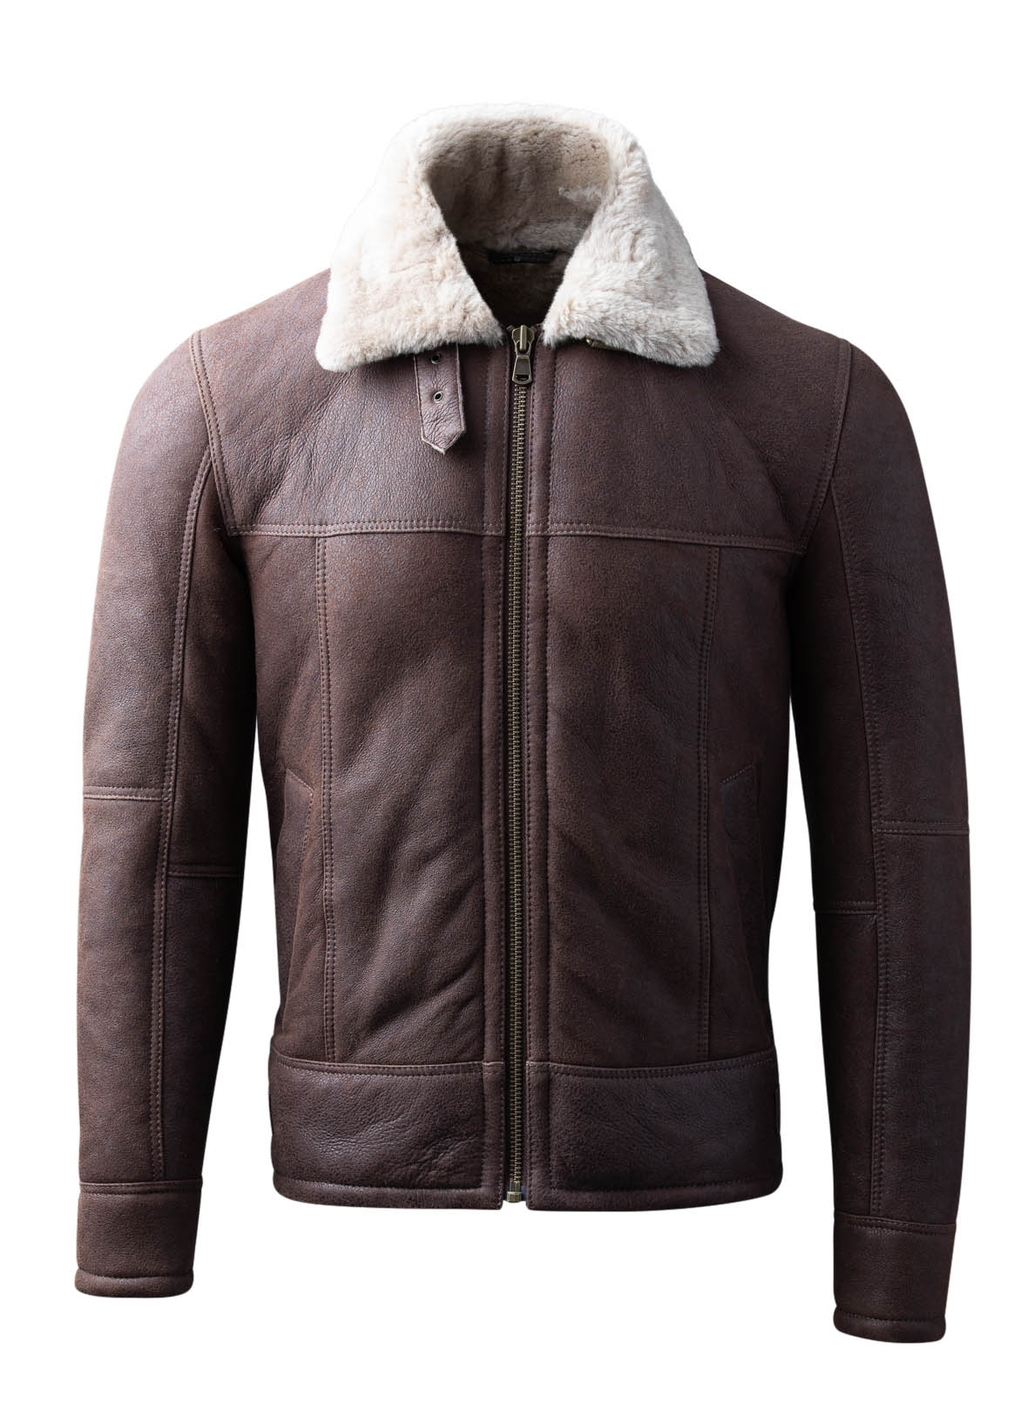 Hawker Sheepskin Flying Jacket in Chocolate Brown